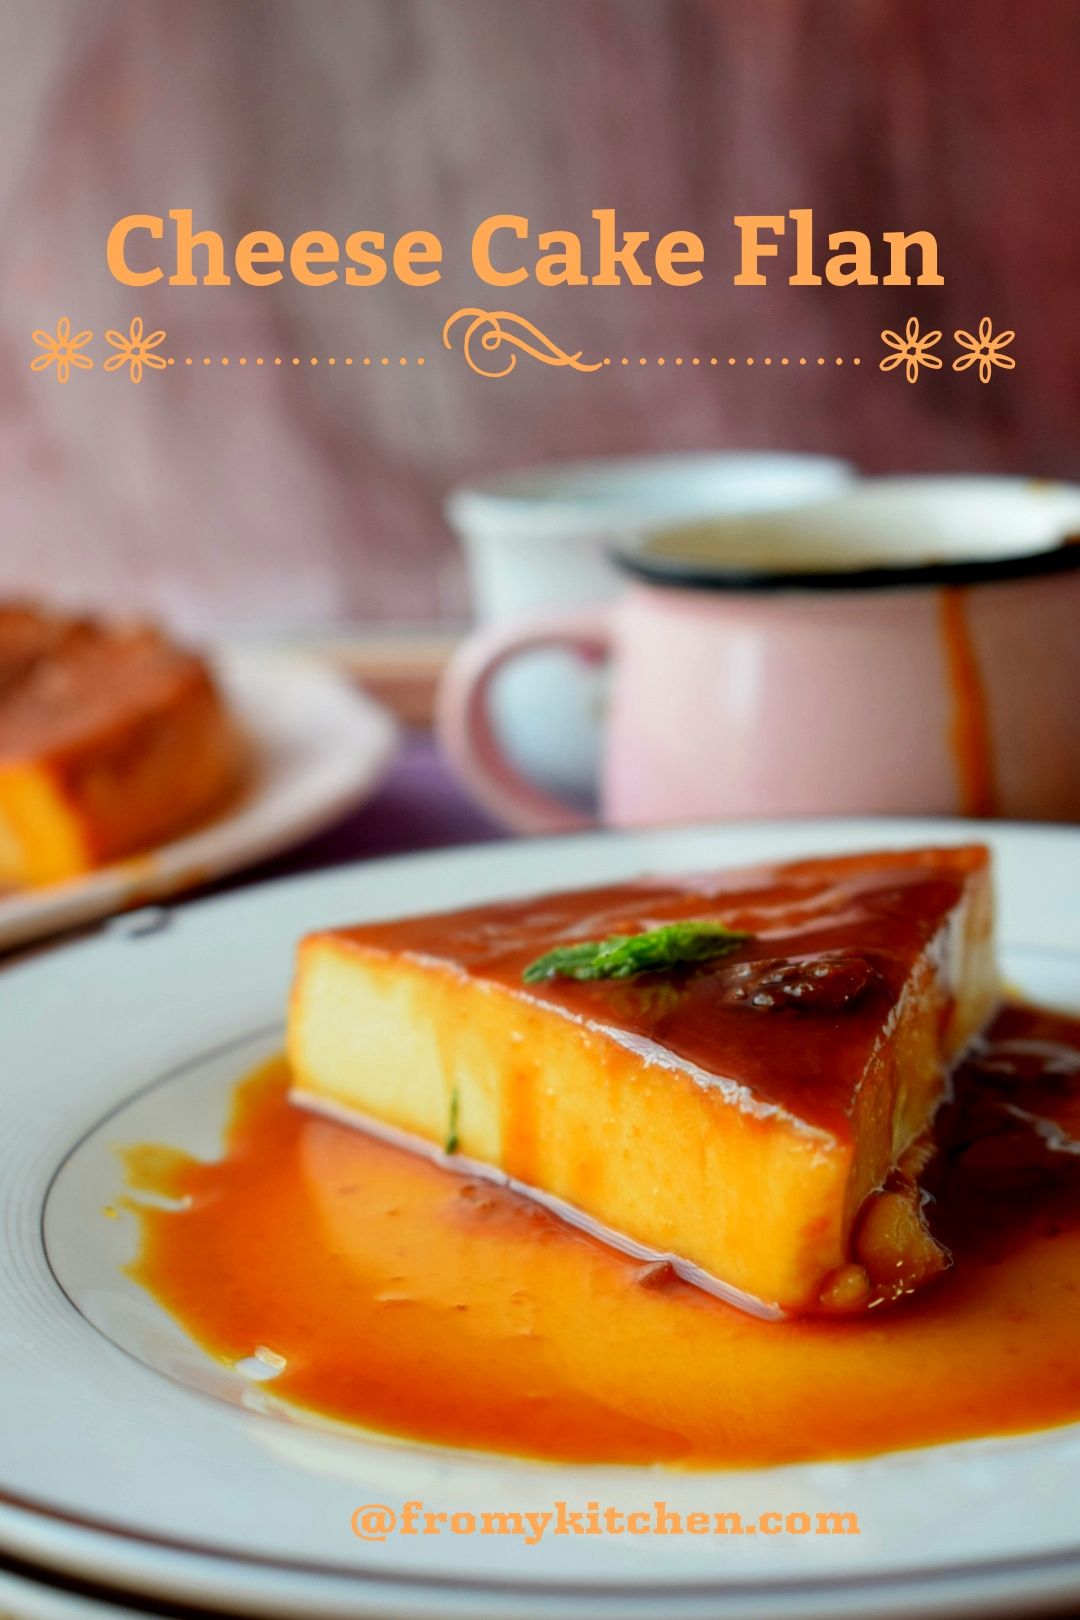 Cheese Cake Flan